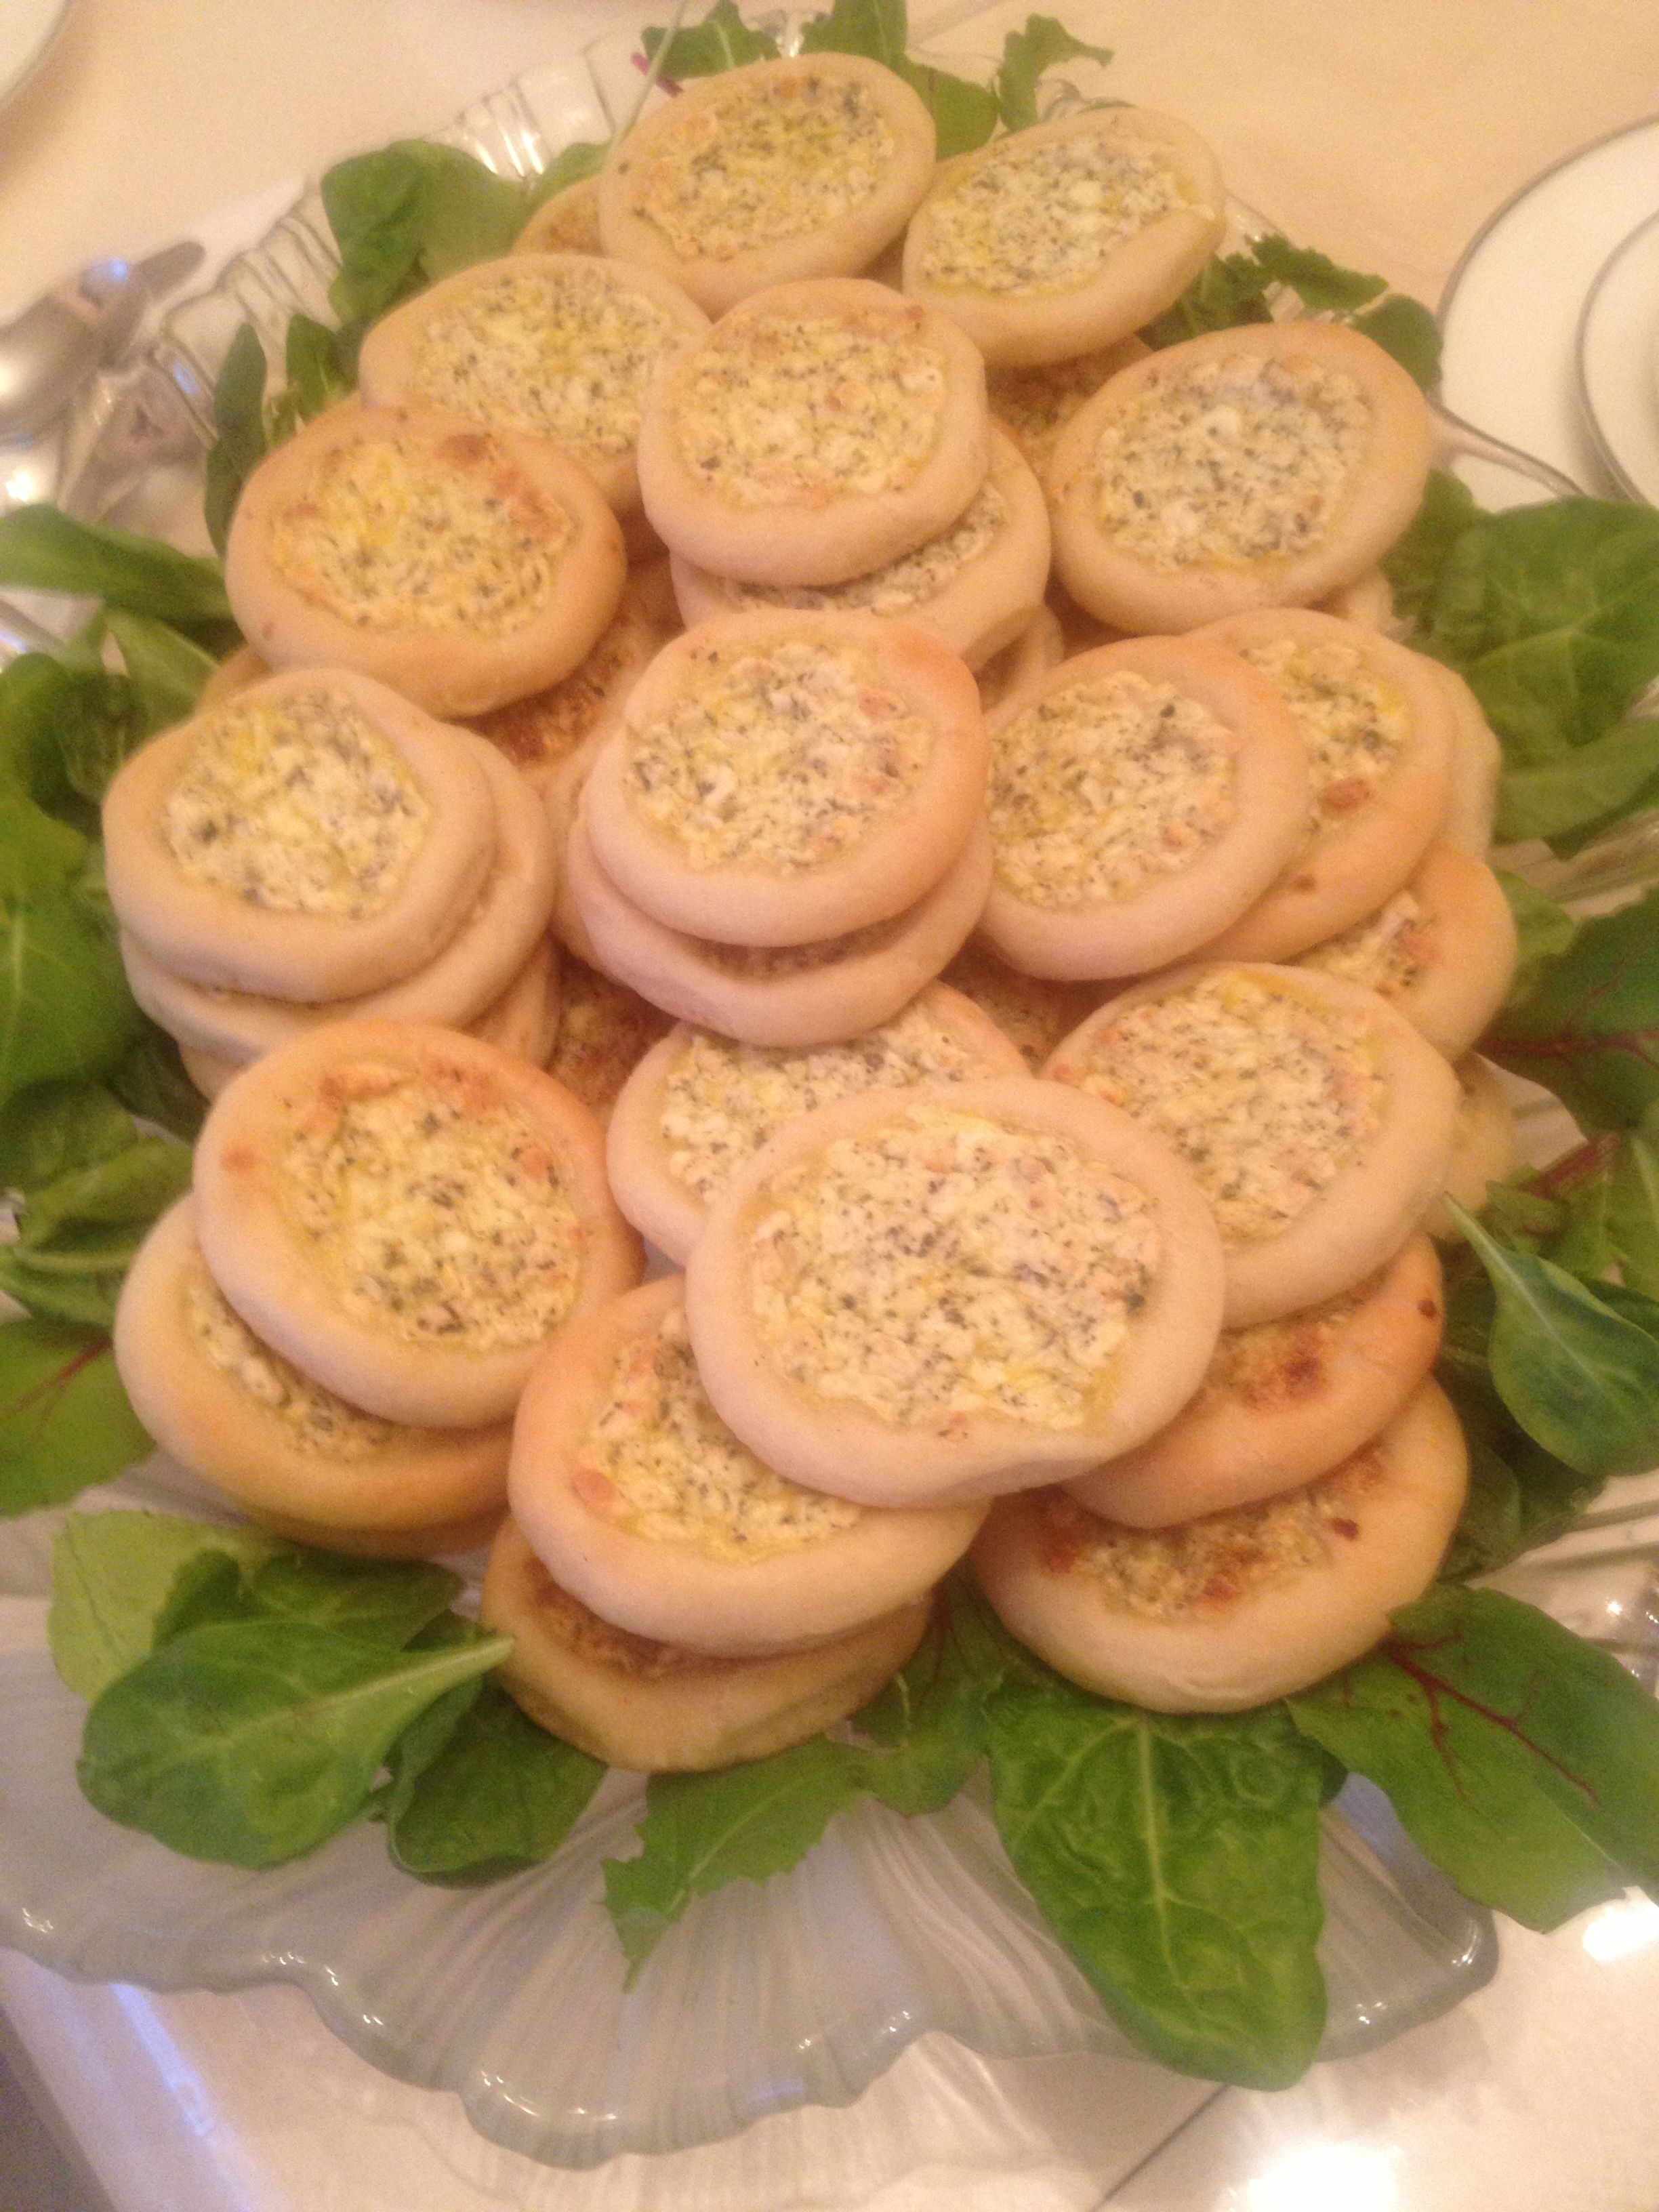 Oregano And Arabic Cheese Fatayer Jordanian Food Food Desserts